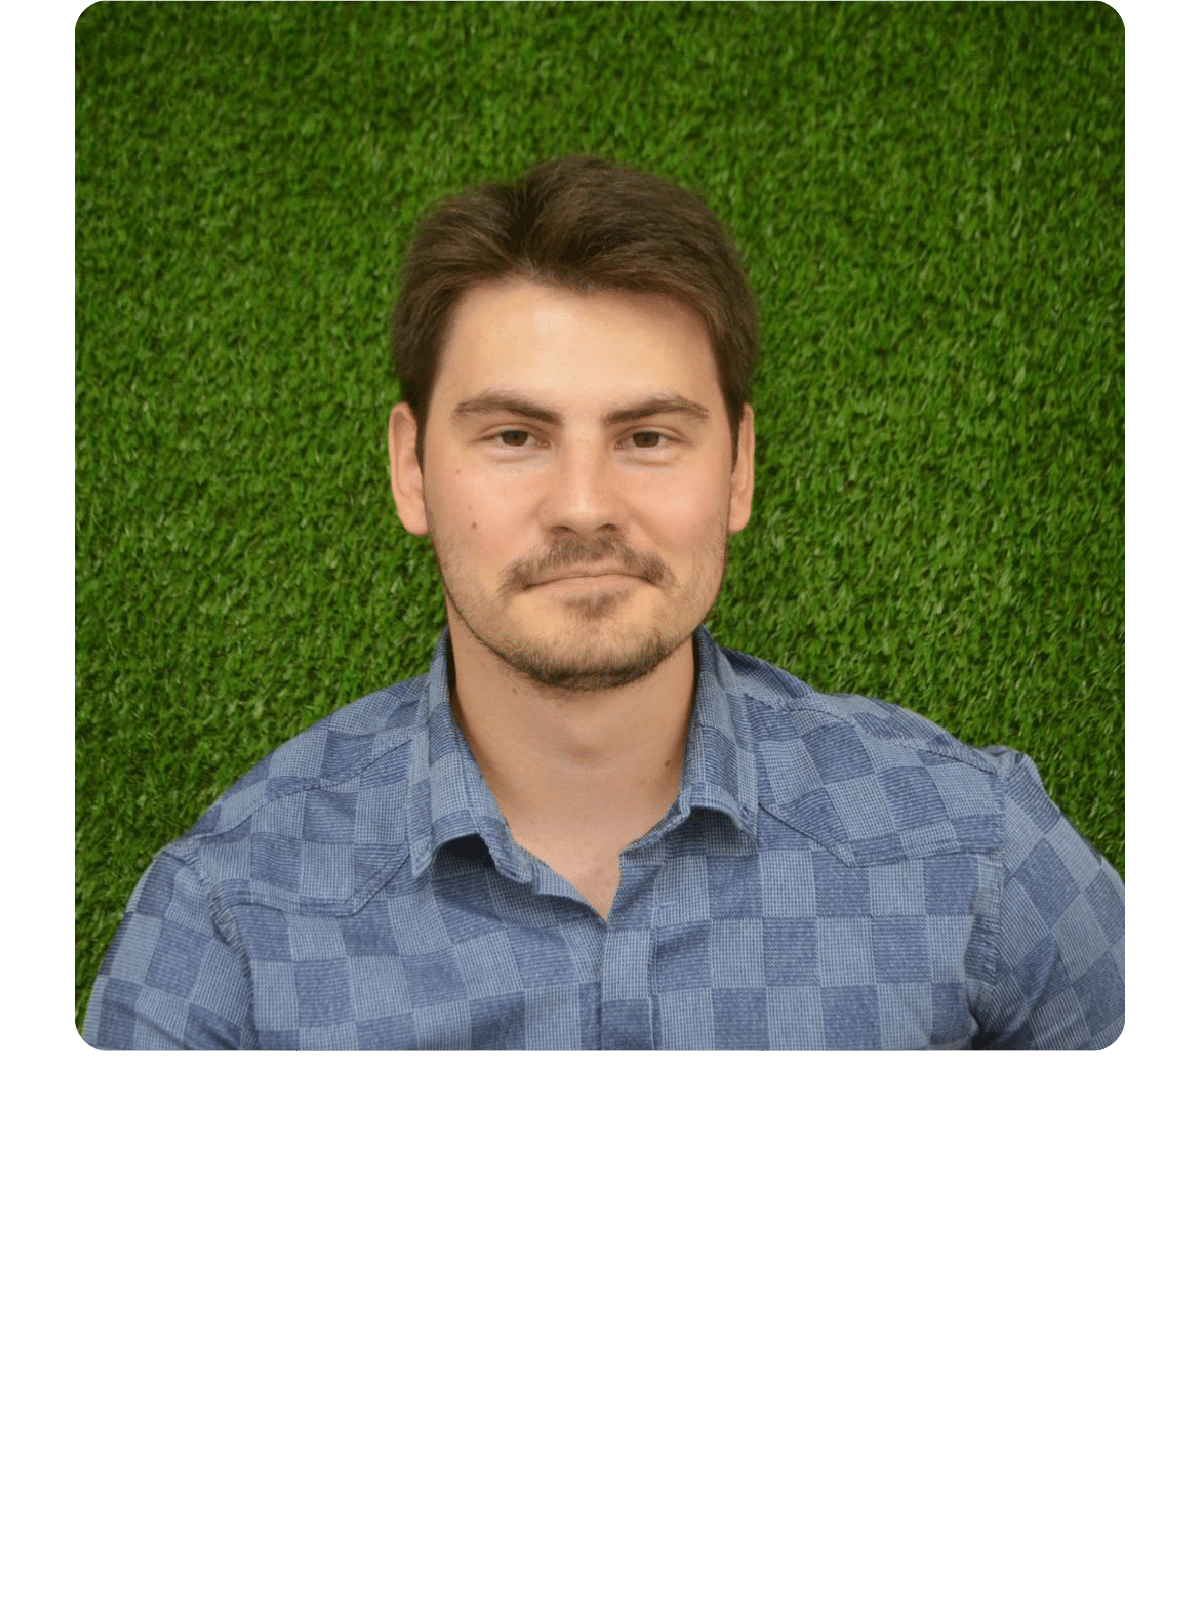 Slavko Pejak